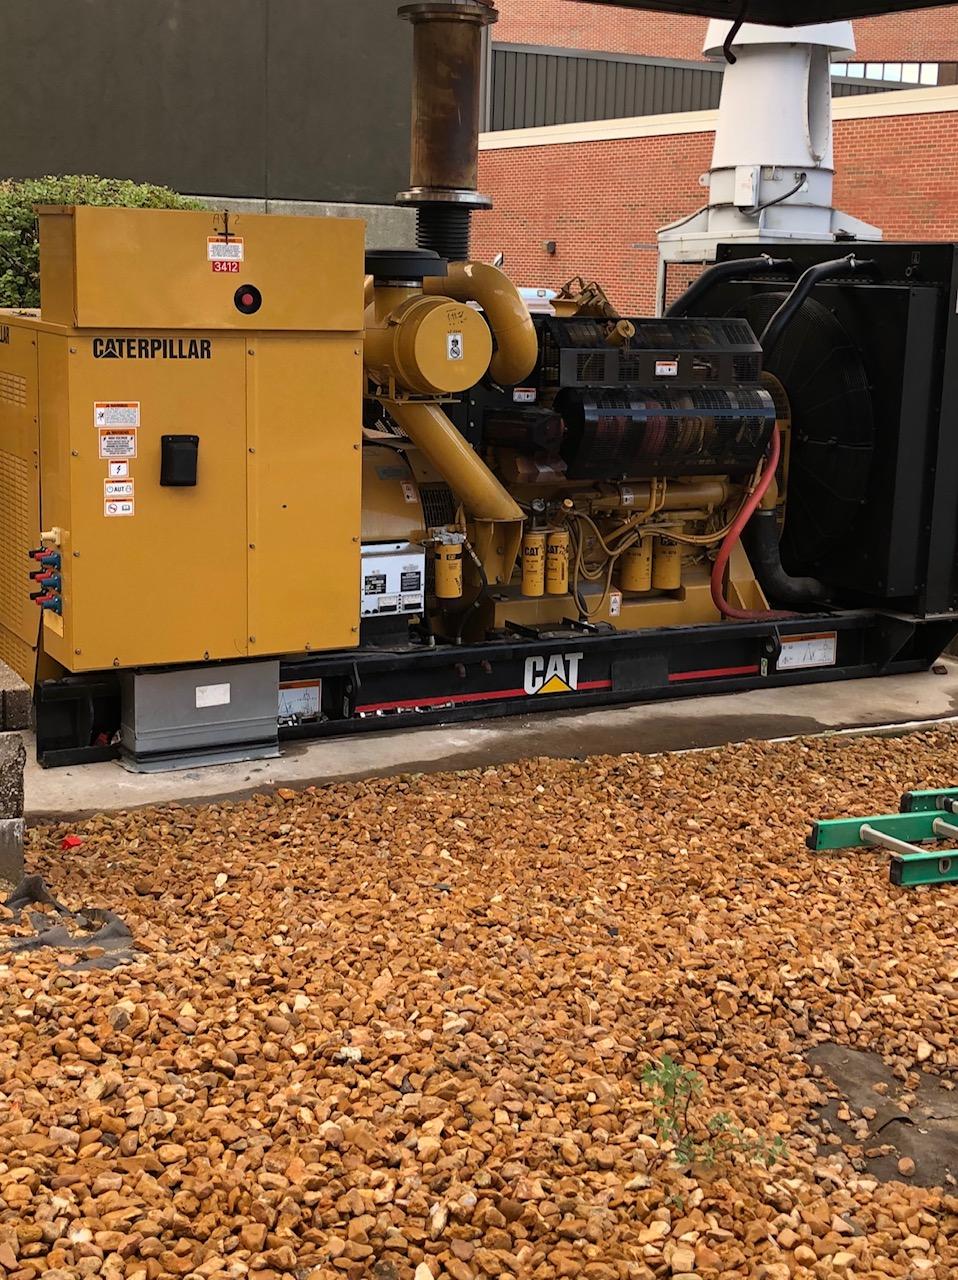 Used 750 KW Caterpillar 3412 Diesel Generator – SOLD!